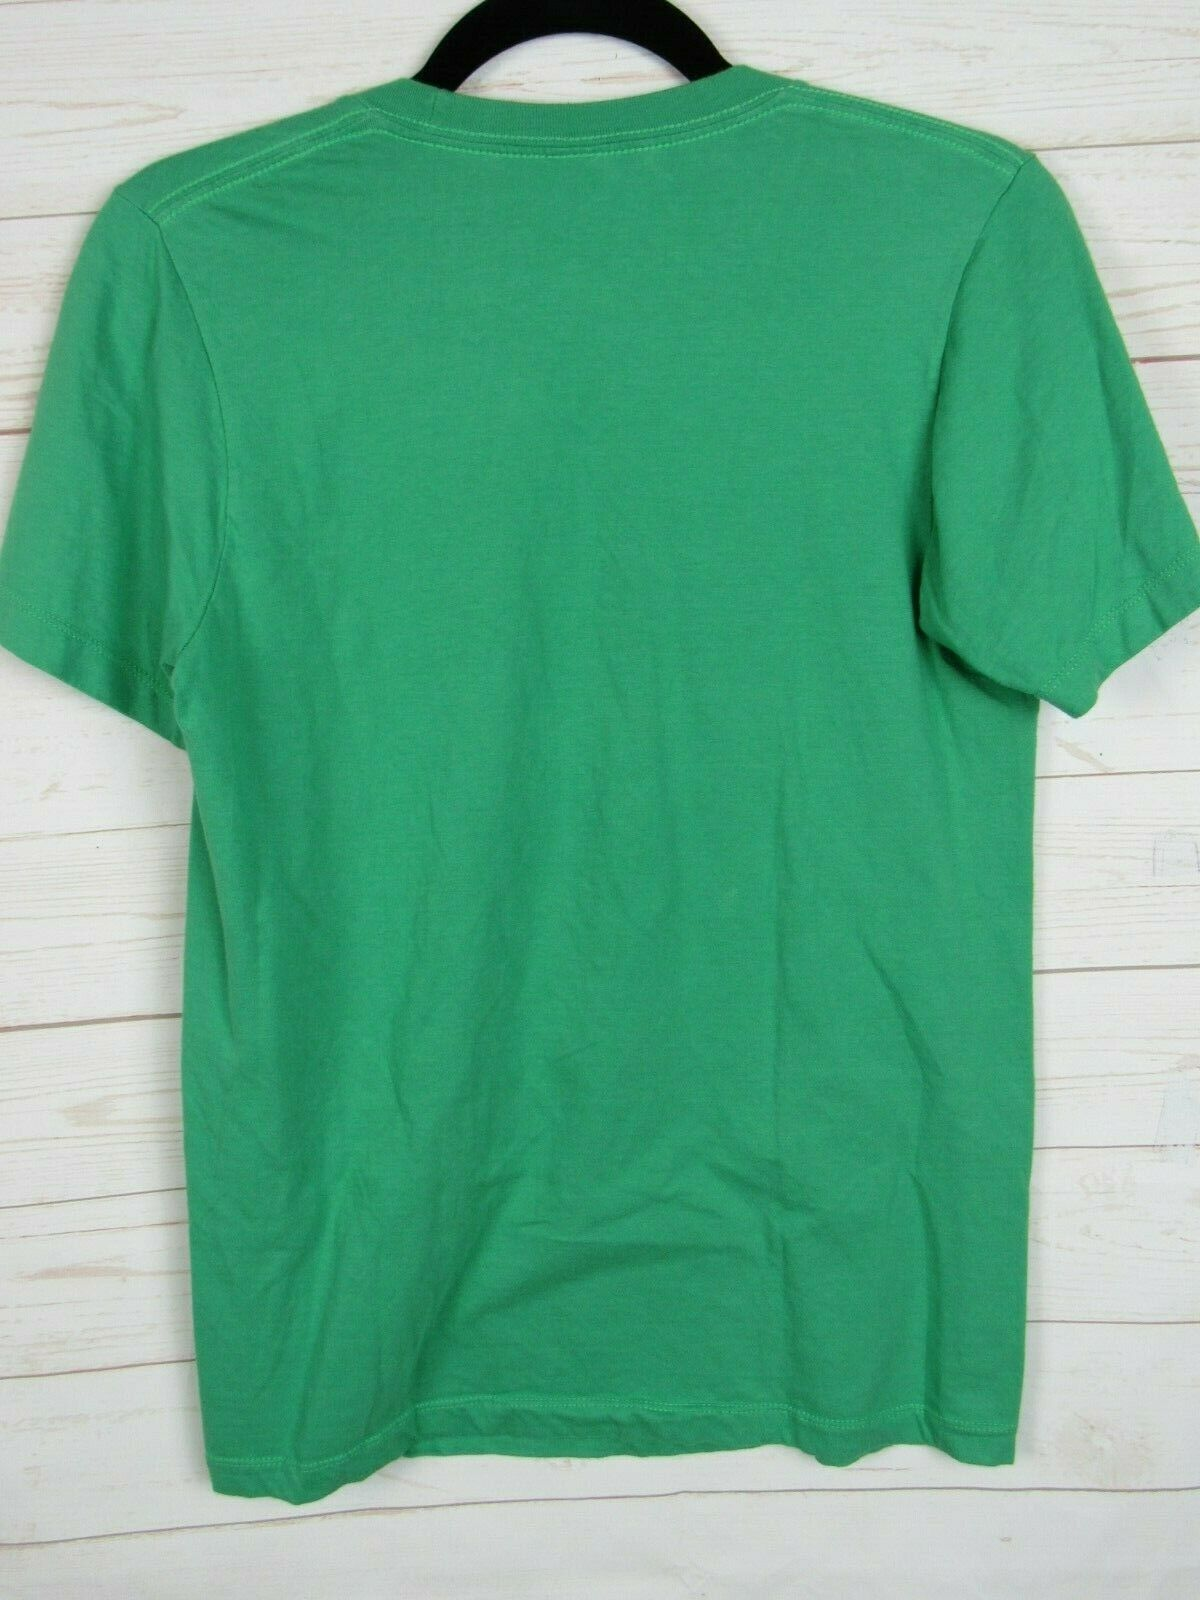 DC Comics Original Unisex Short Sleeve Green w/Green Lantern Logo Size S W1022